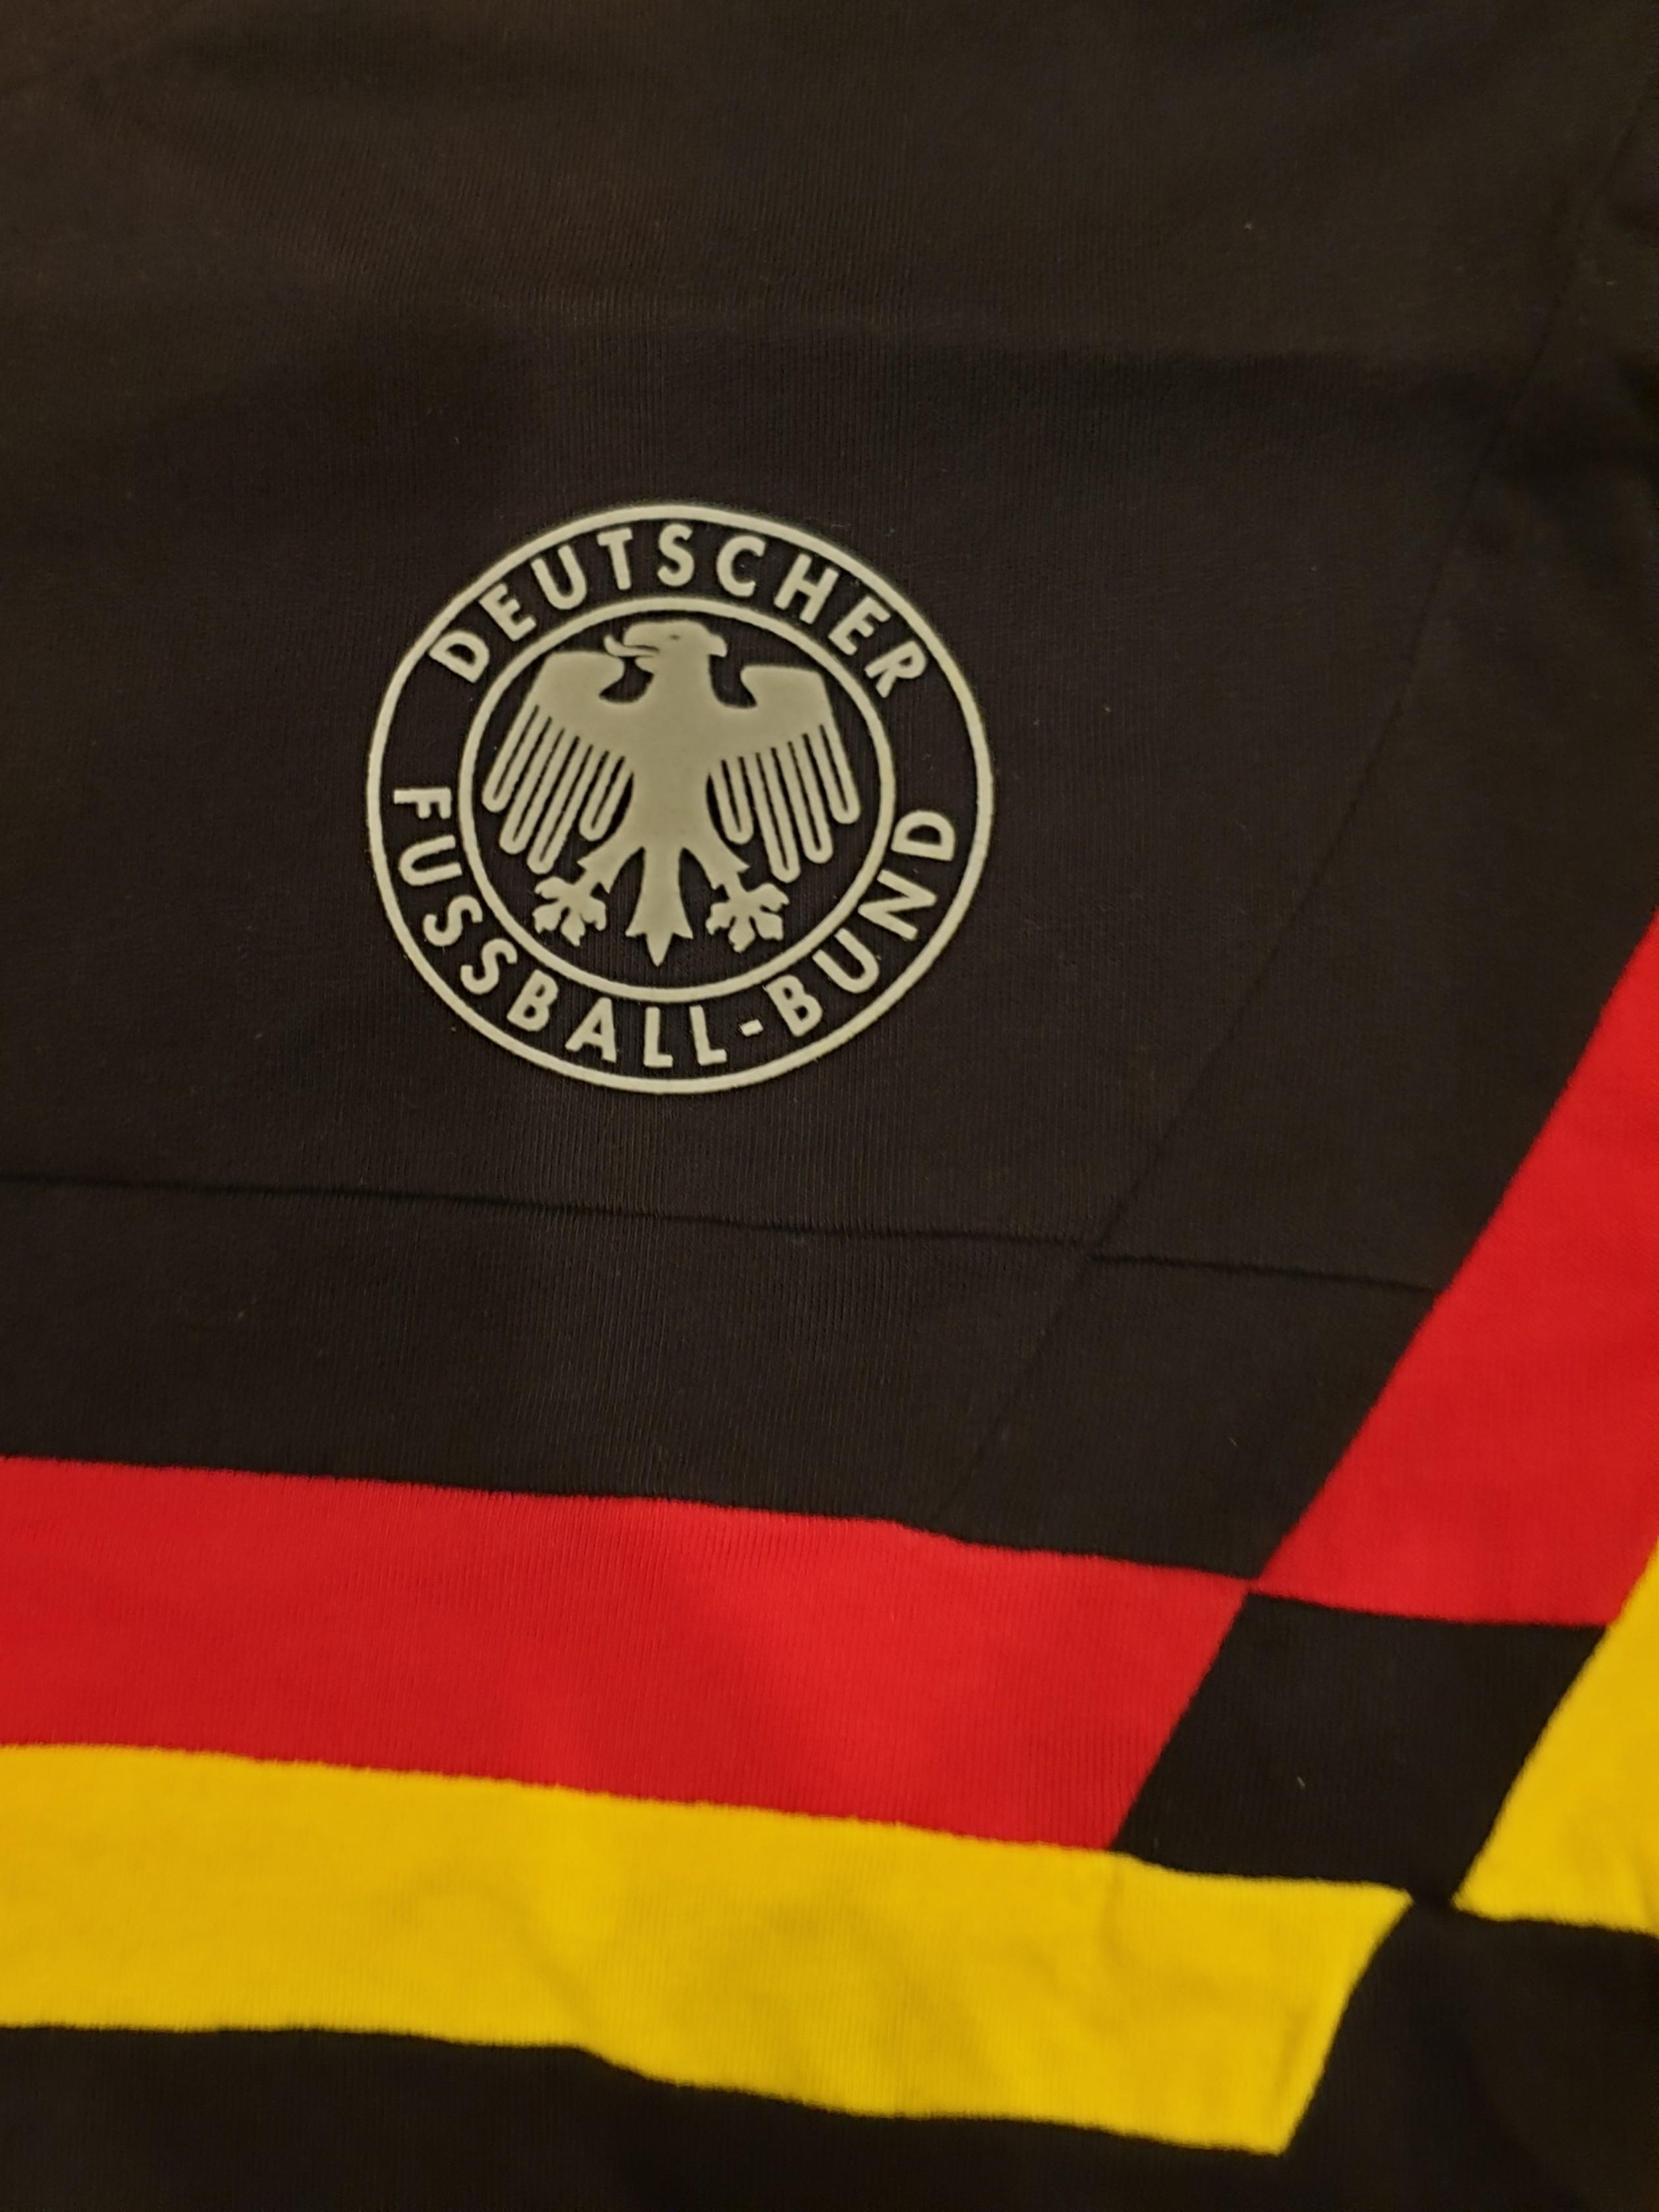 Vintage Adidas Germany T shirt., Sports, Sports Apparel on